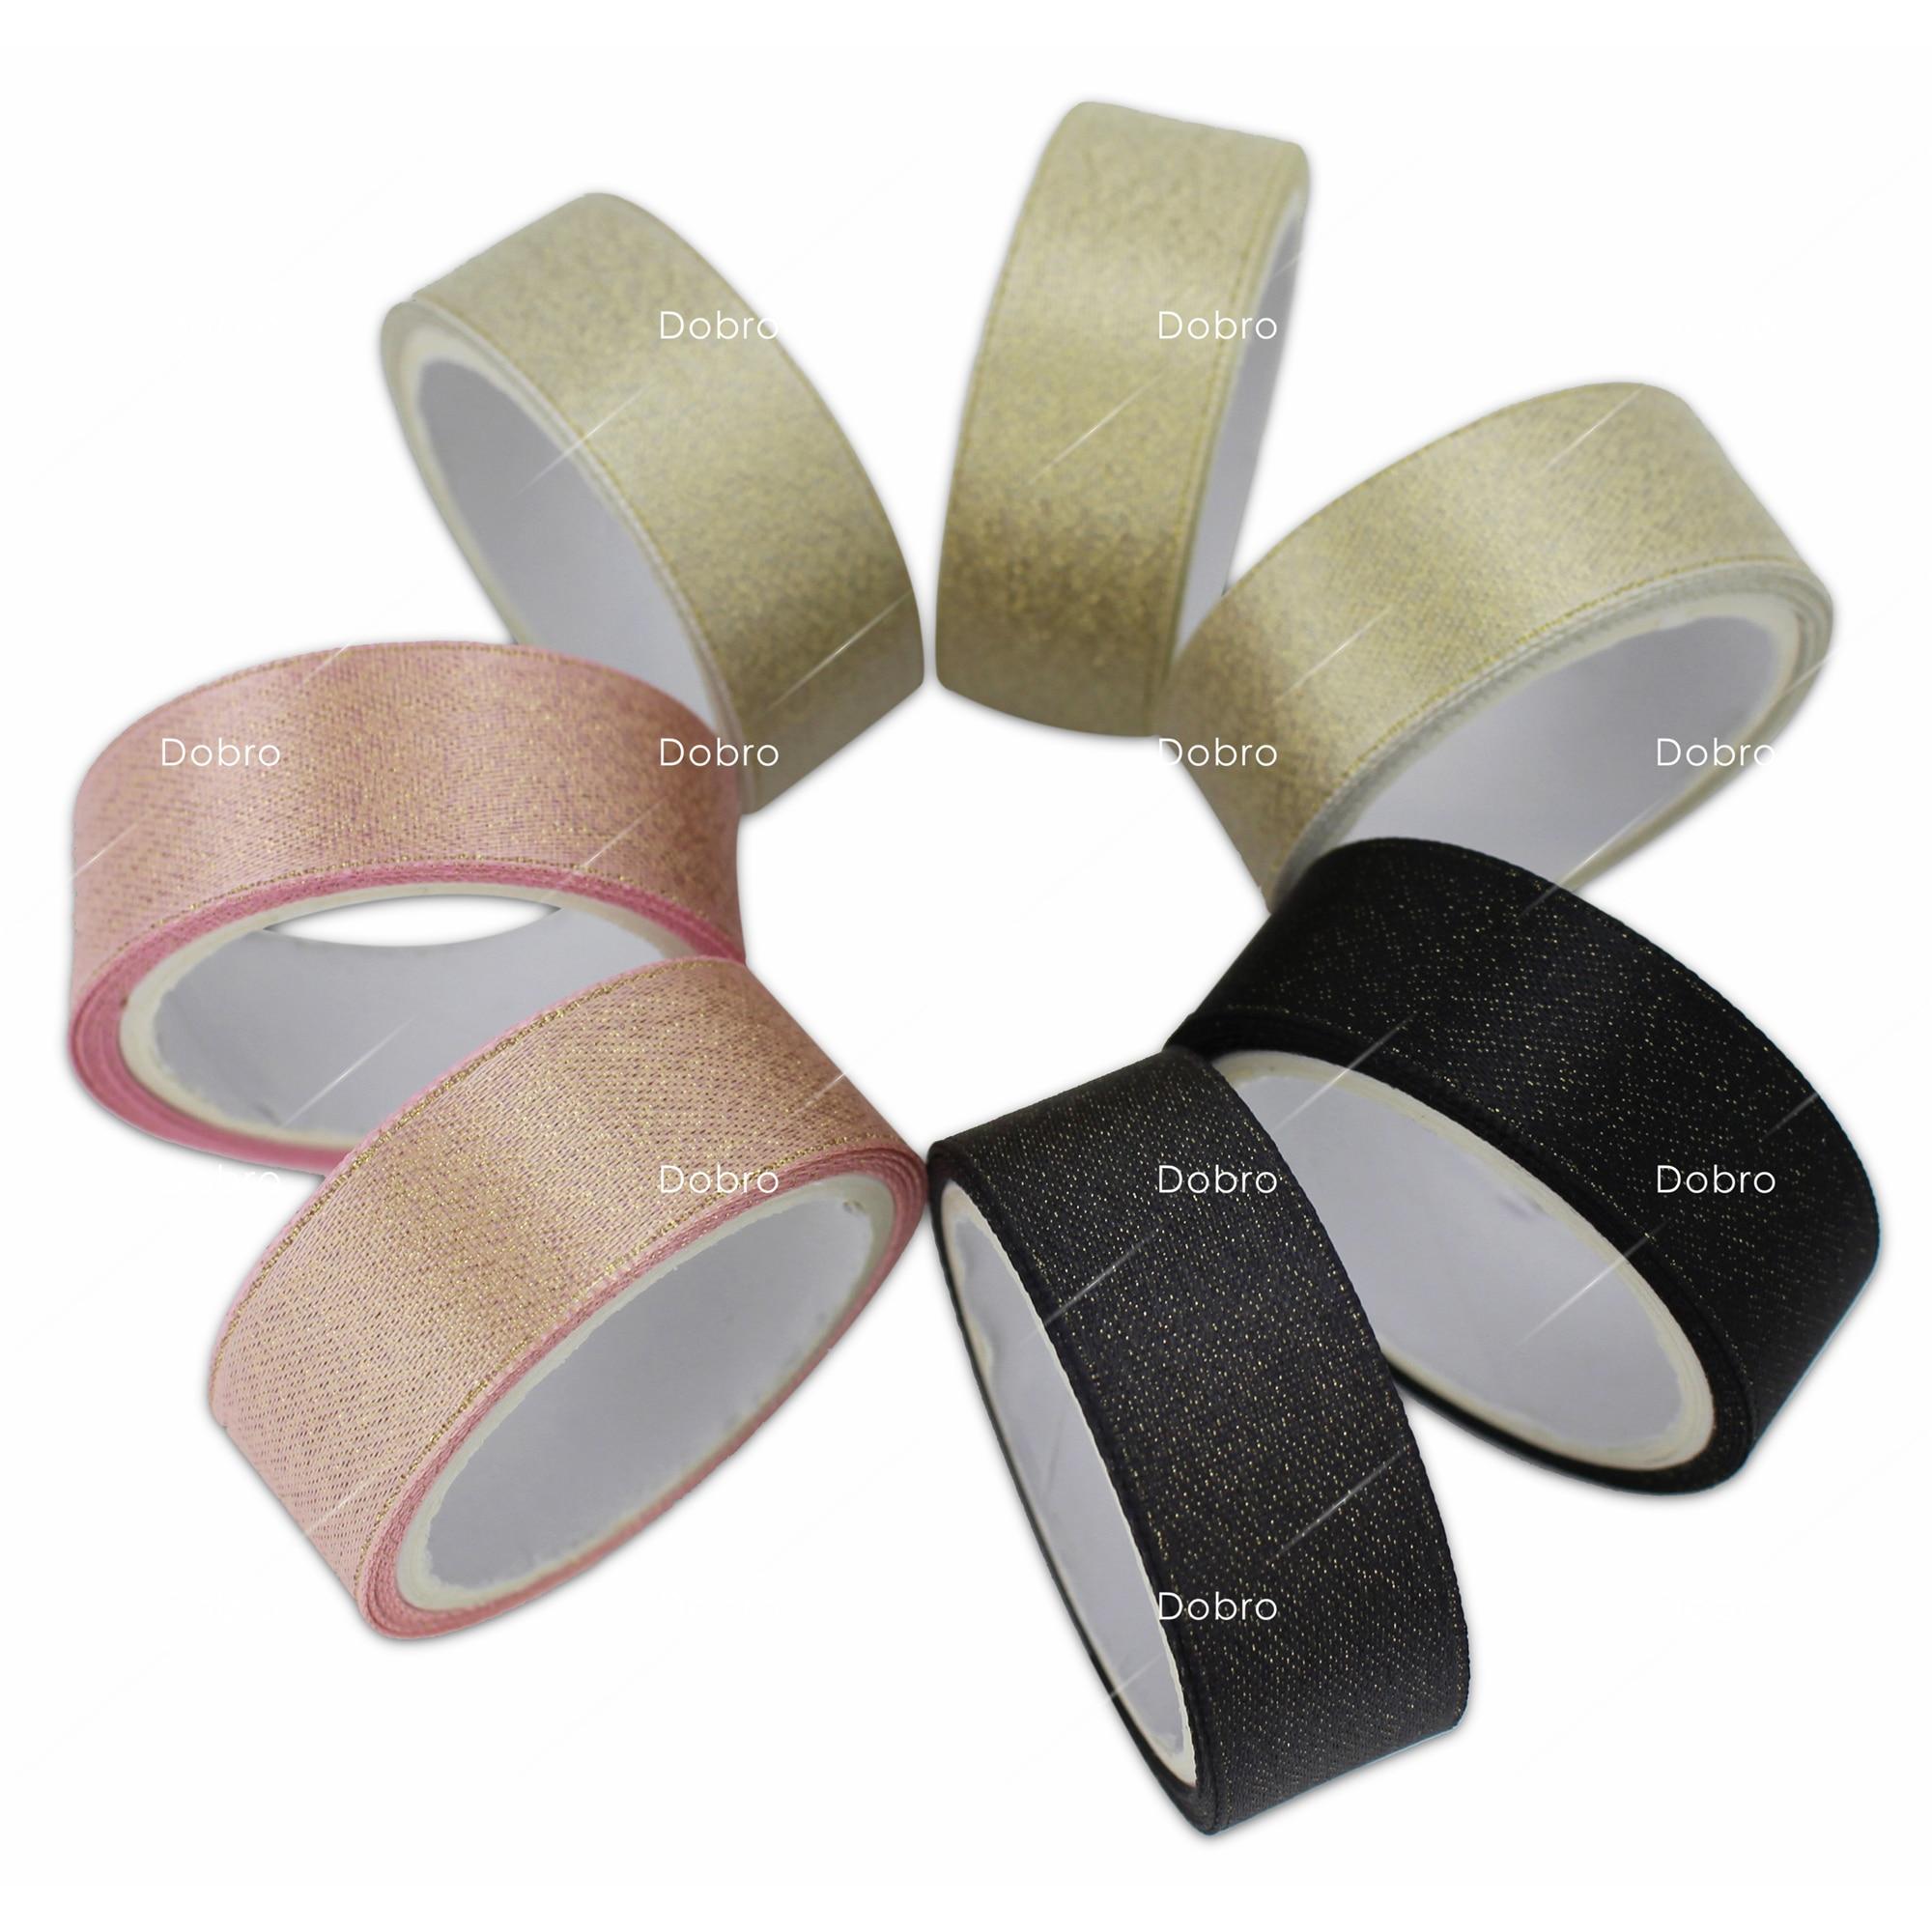 35 Colors Gold Purl Satin Ribbon 3 6 9 16 22 38mm - Өнер, қолөнер және тігін - фото 3